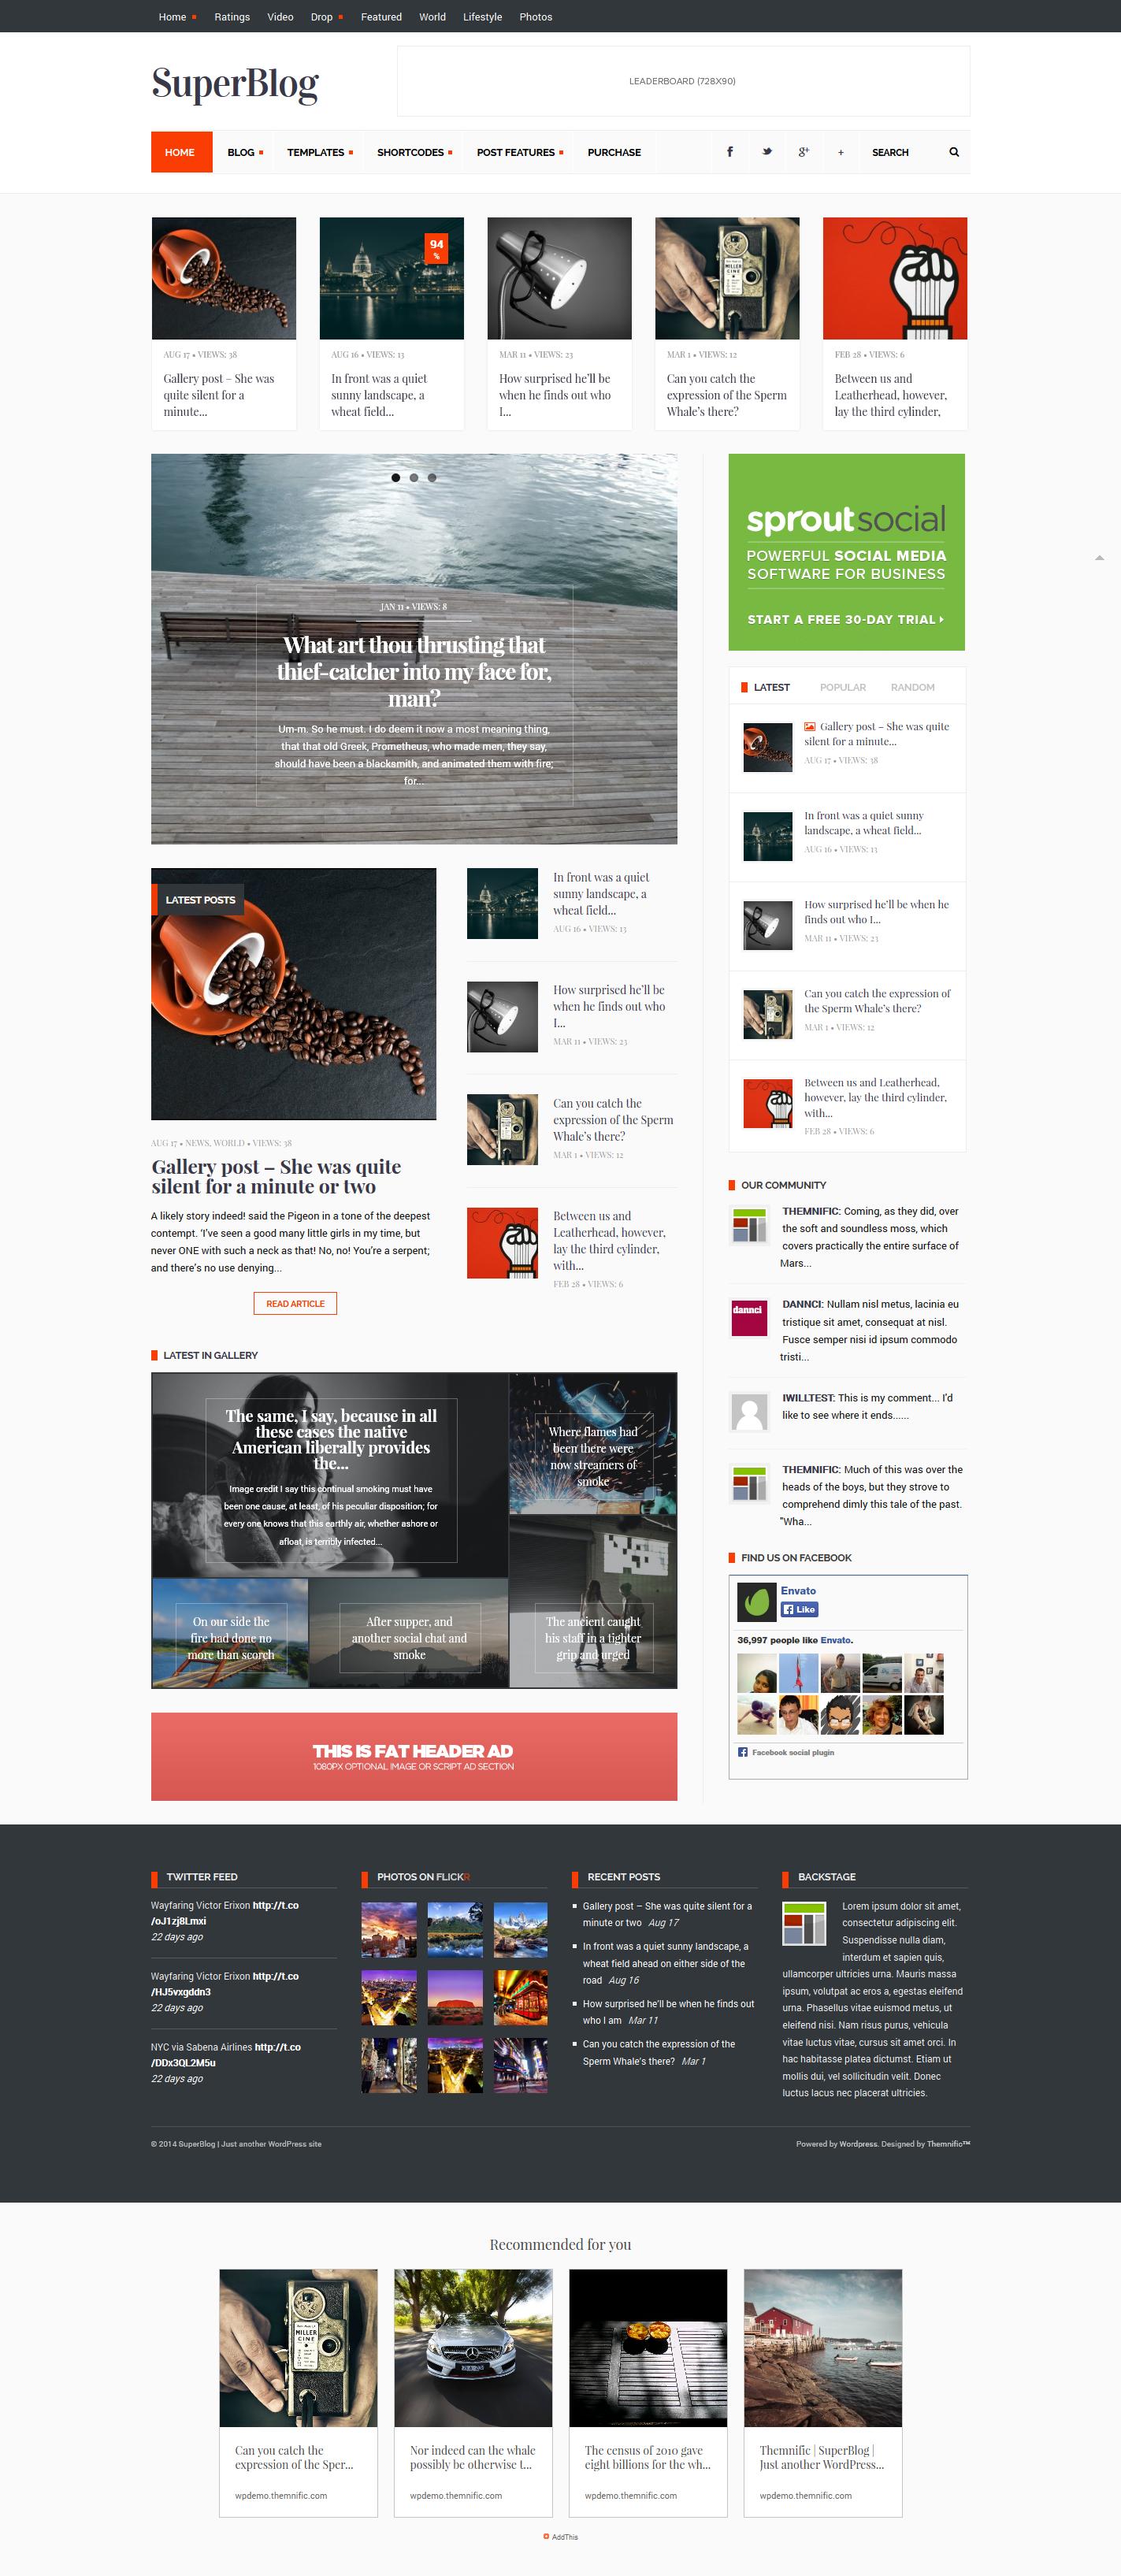 SuperBlog - Powerful Blog & Magazine Theme by Dannci   ThemeForest